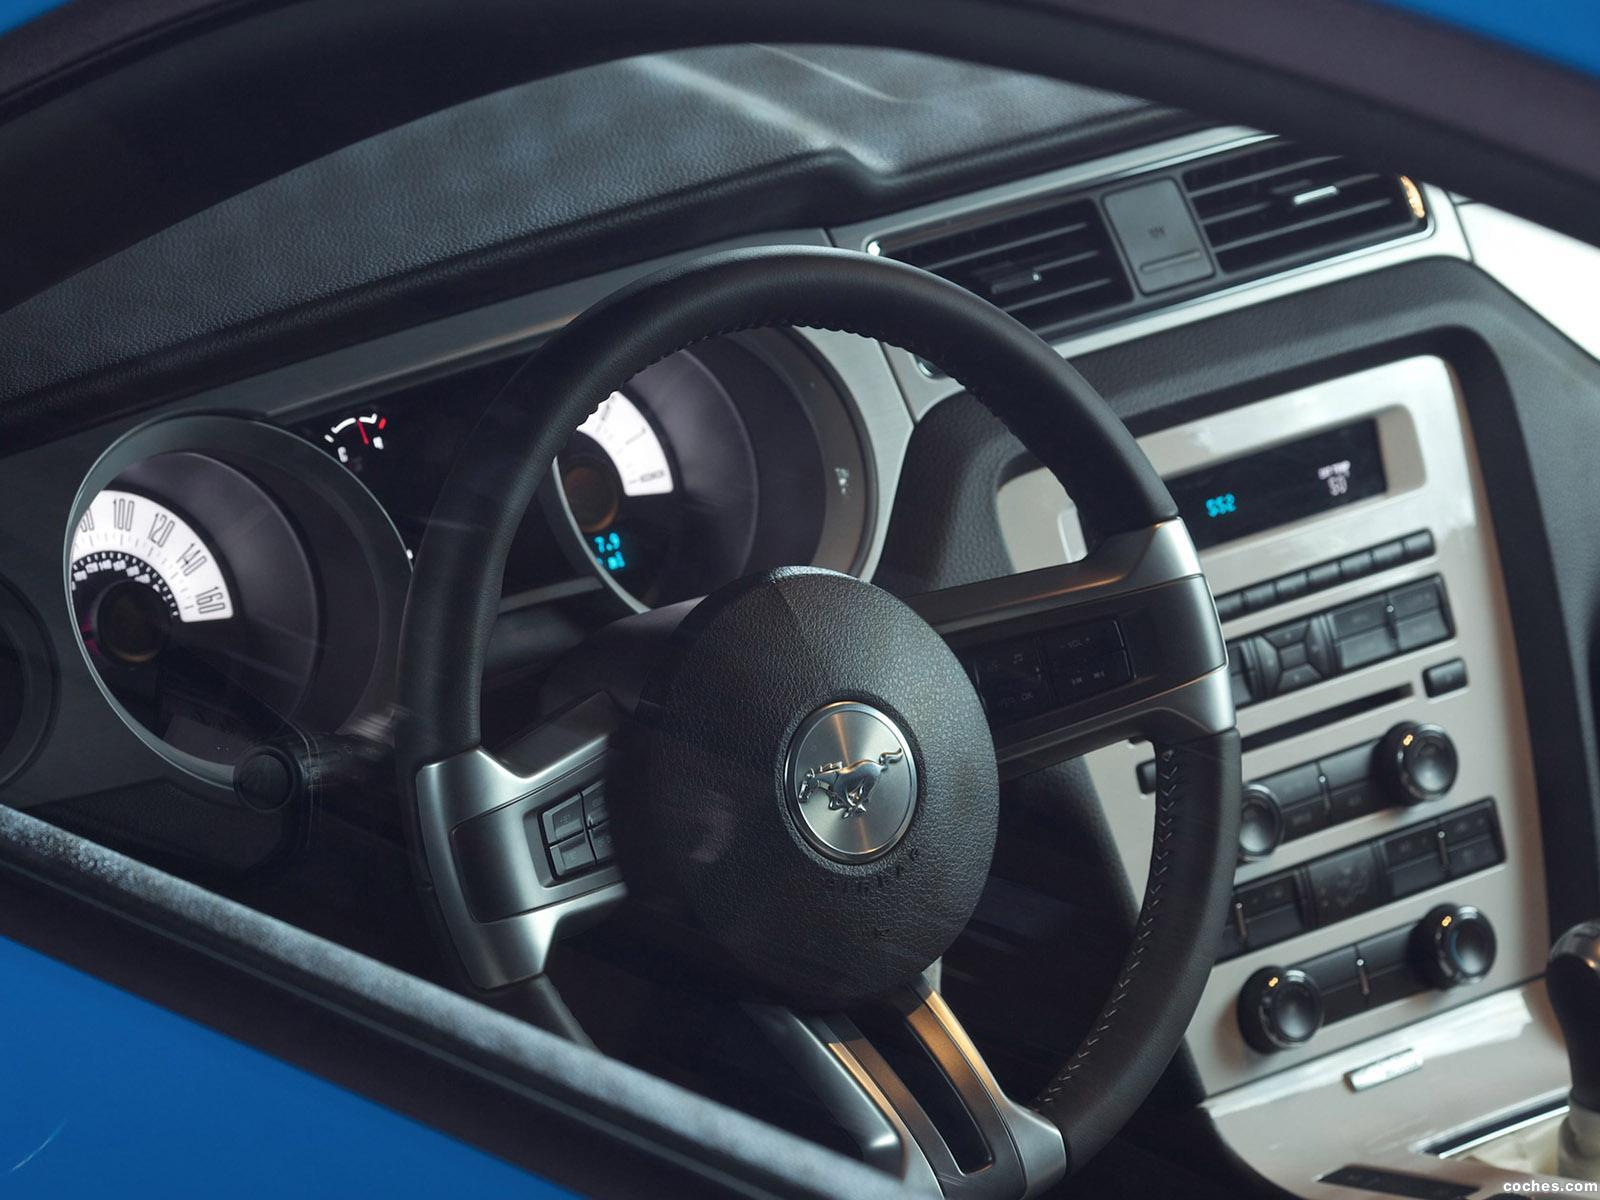 Foto 4 de H&R Ford Mustang GT 5.0 Project Legend 2011